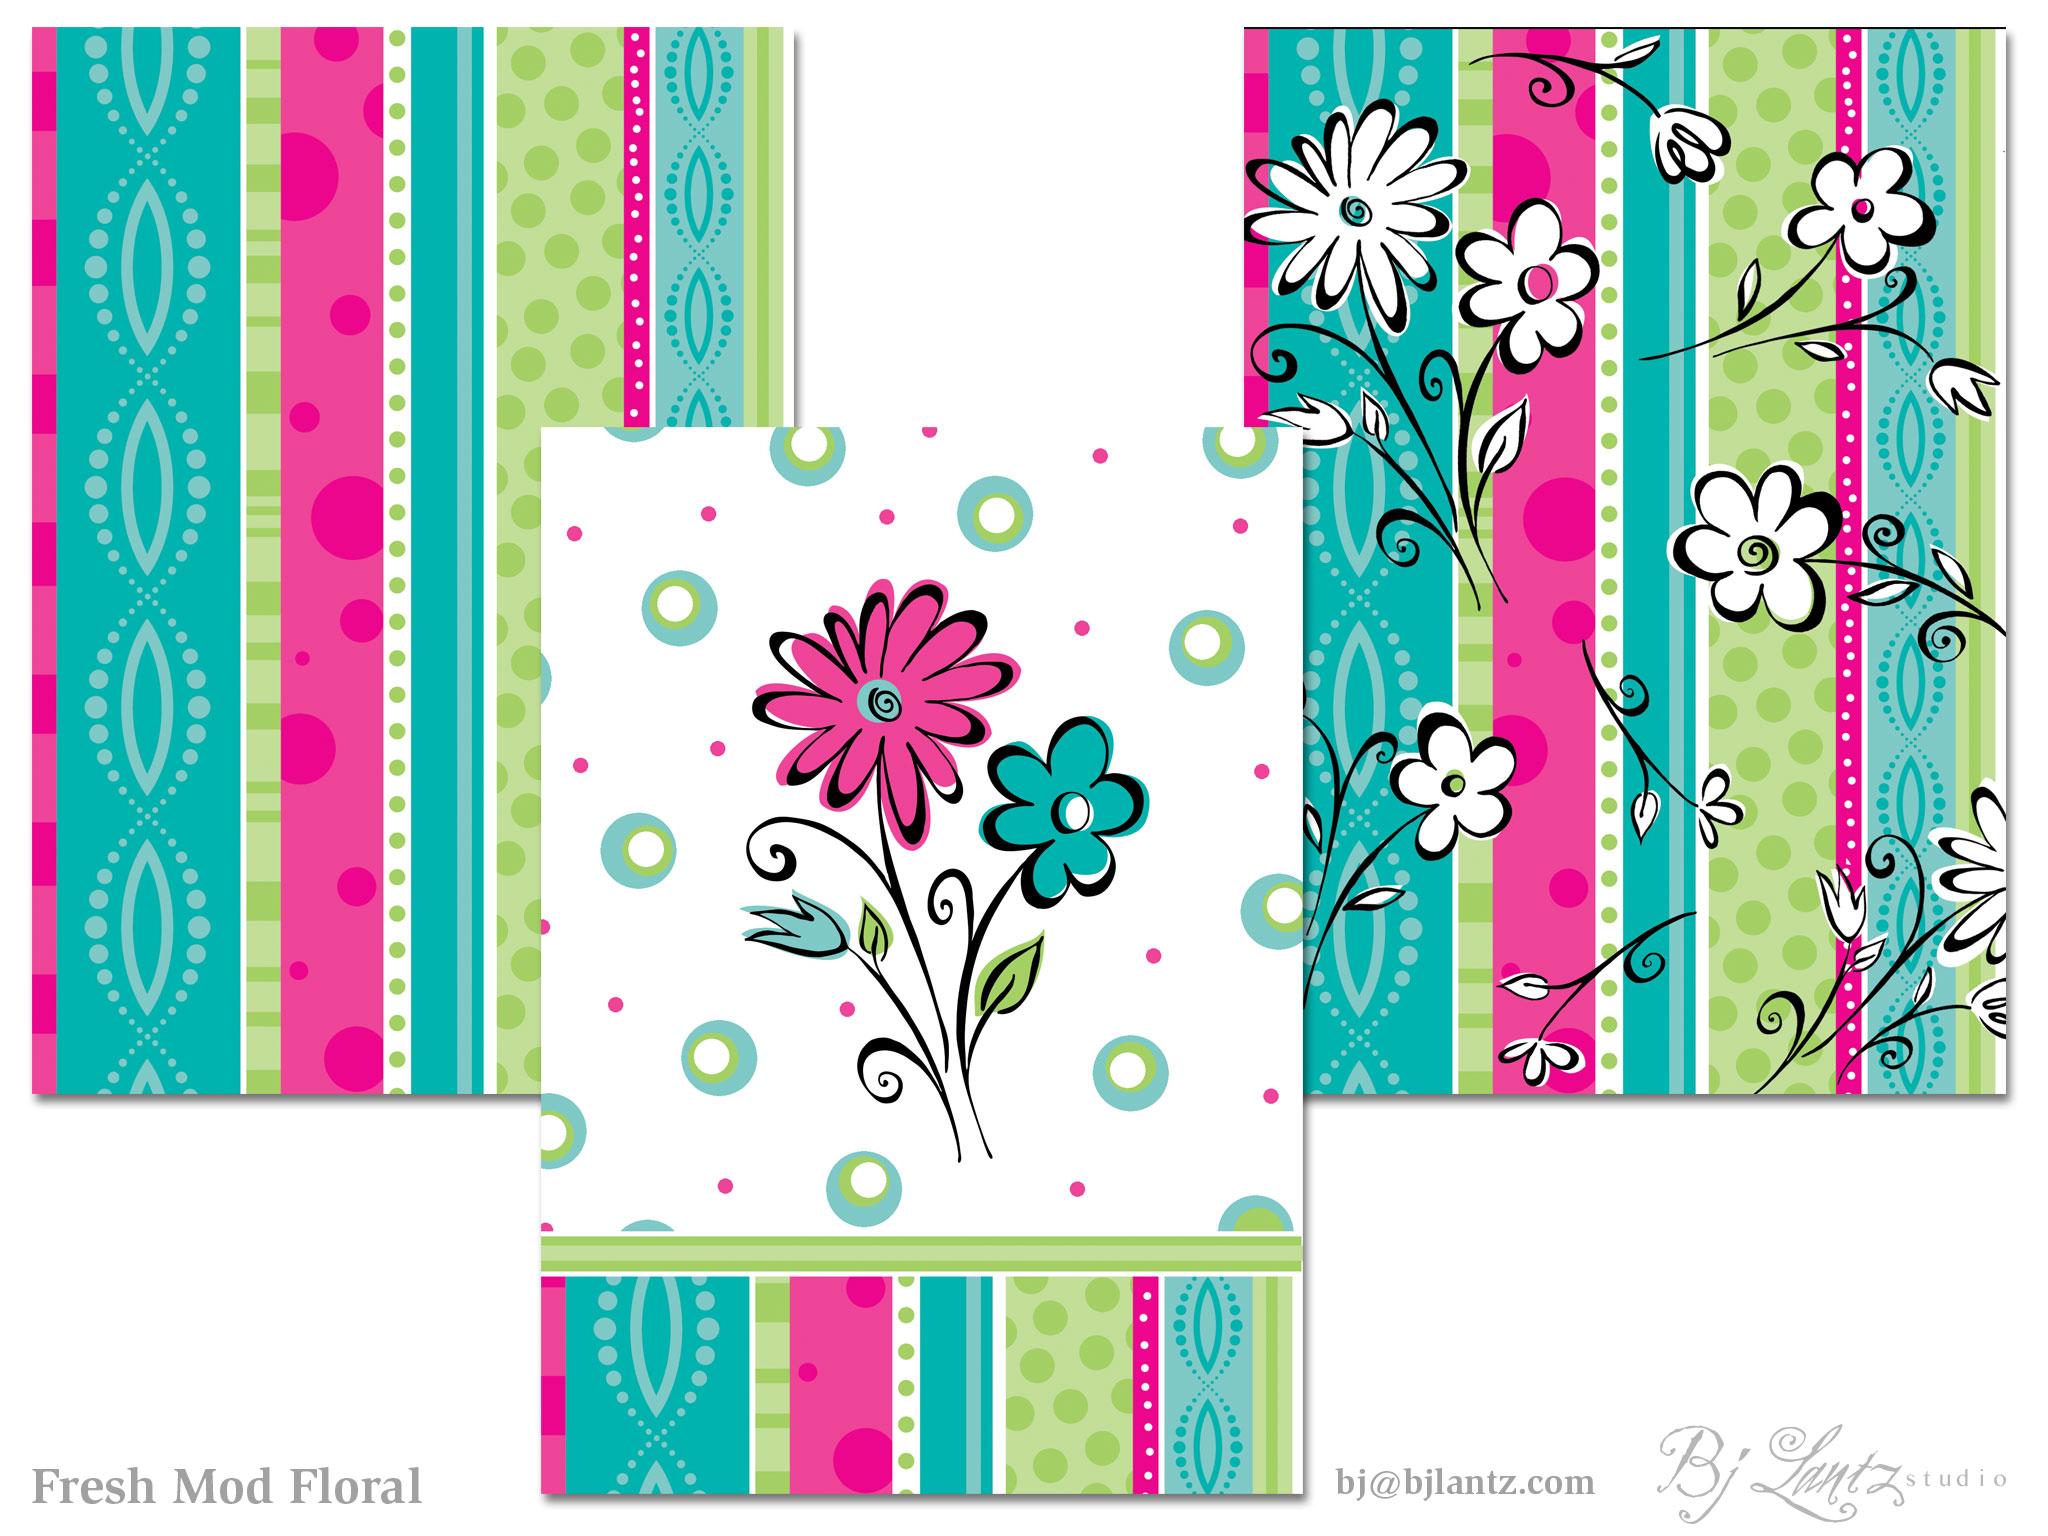 FreshMod-floral_BJLantz_1.jpg